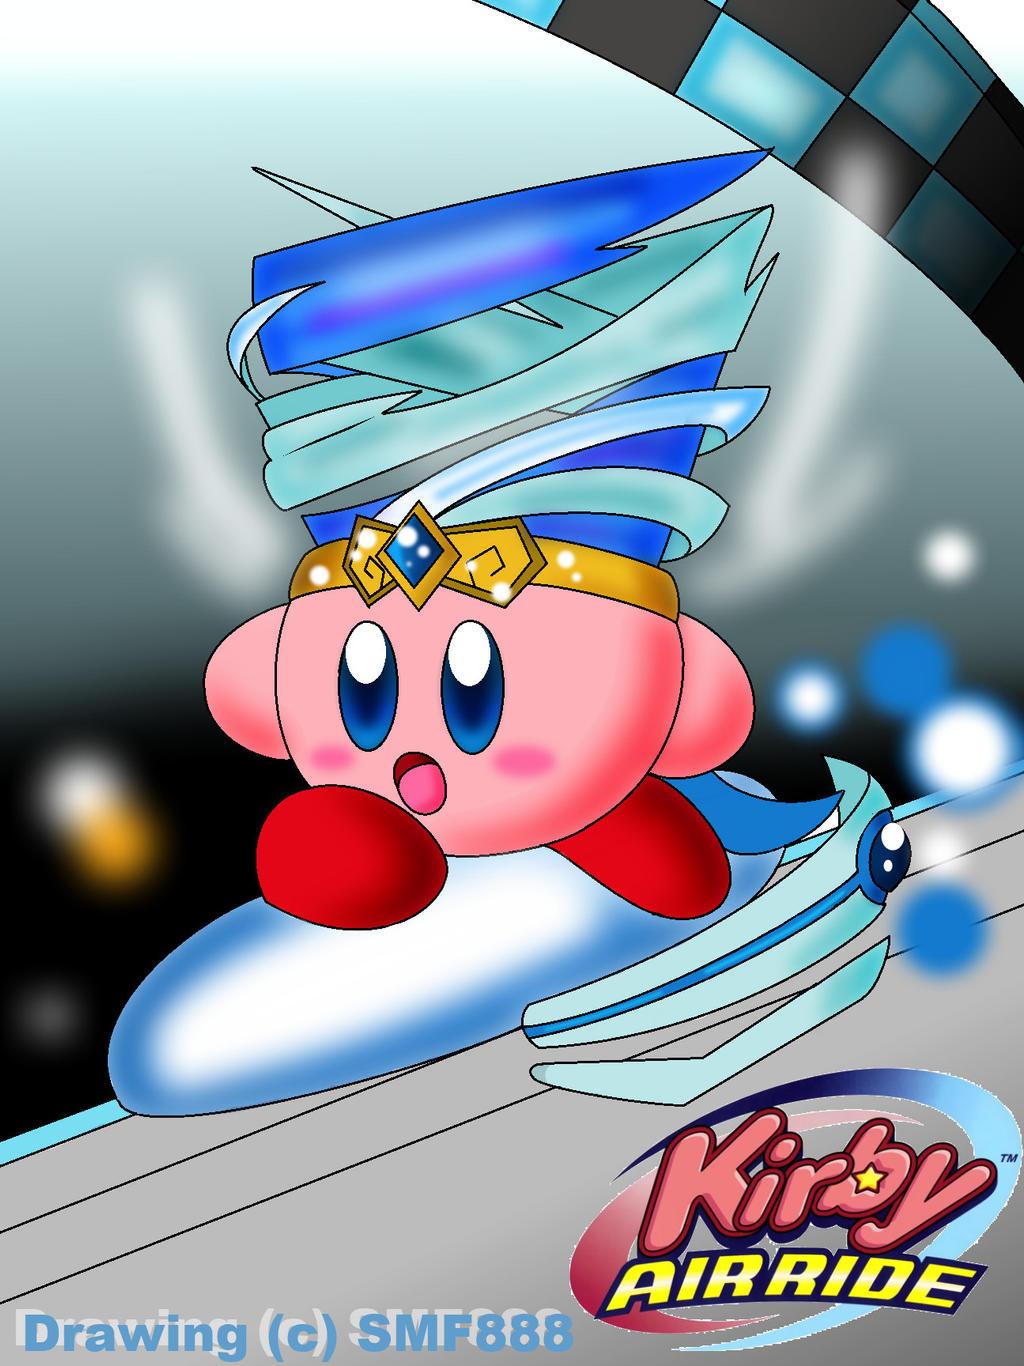 :Kirby: Racing Through by SuperMarioFan888